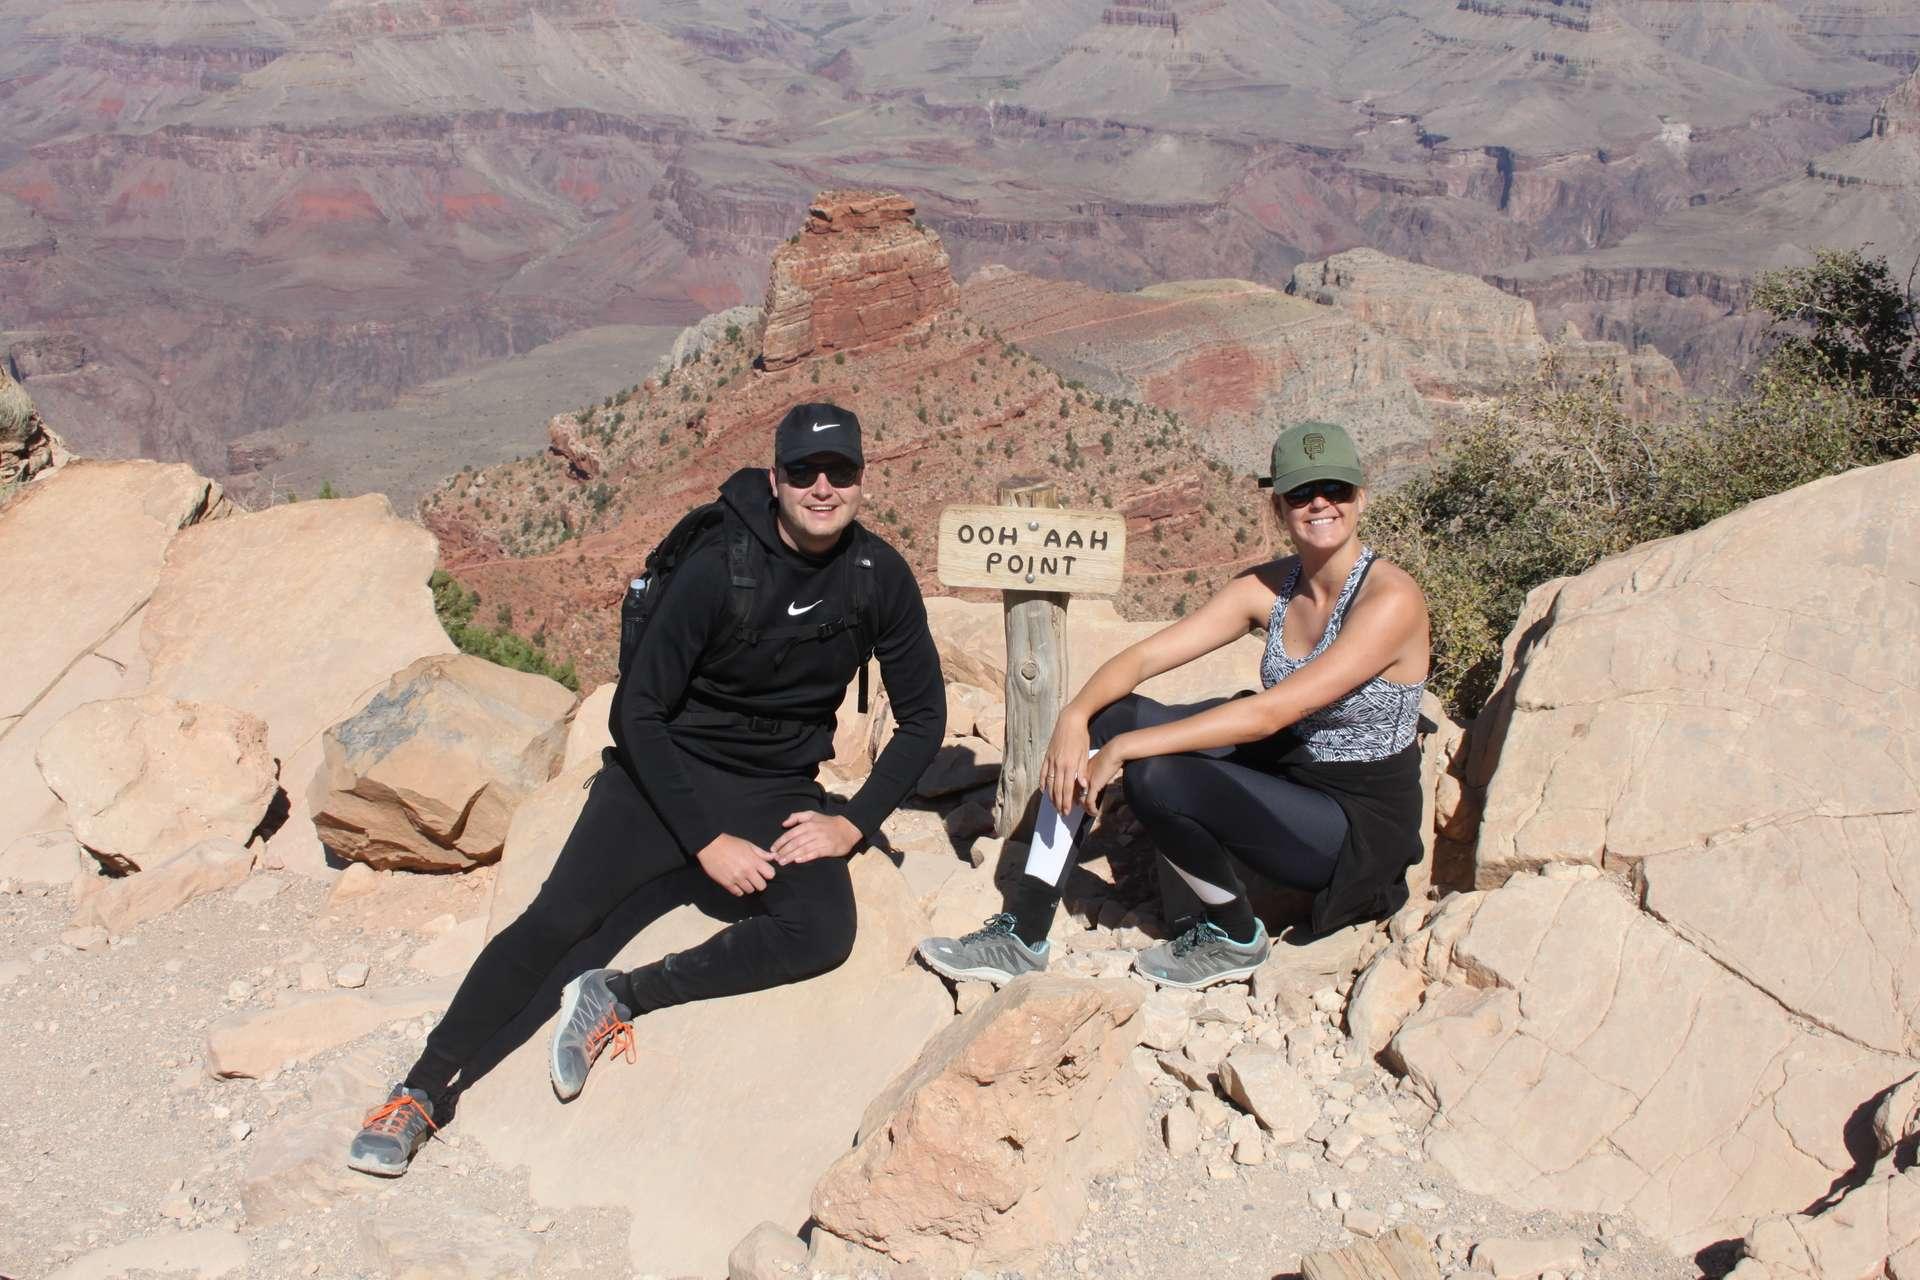 Amerika, Grand Canyon, Ooh Aah point